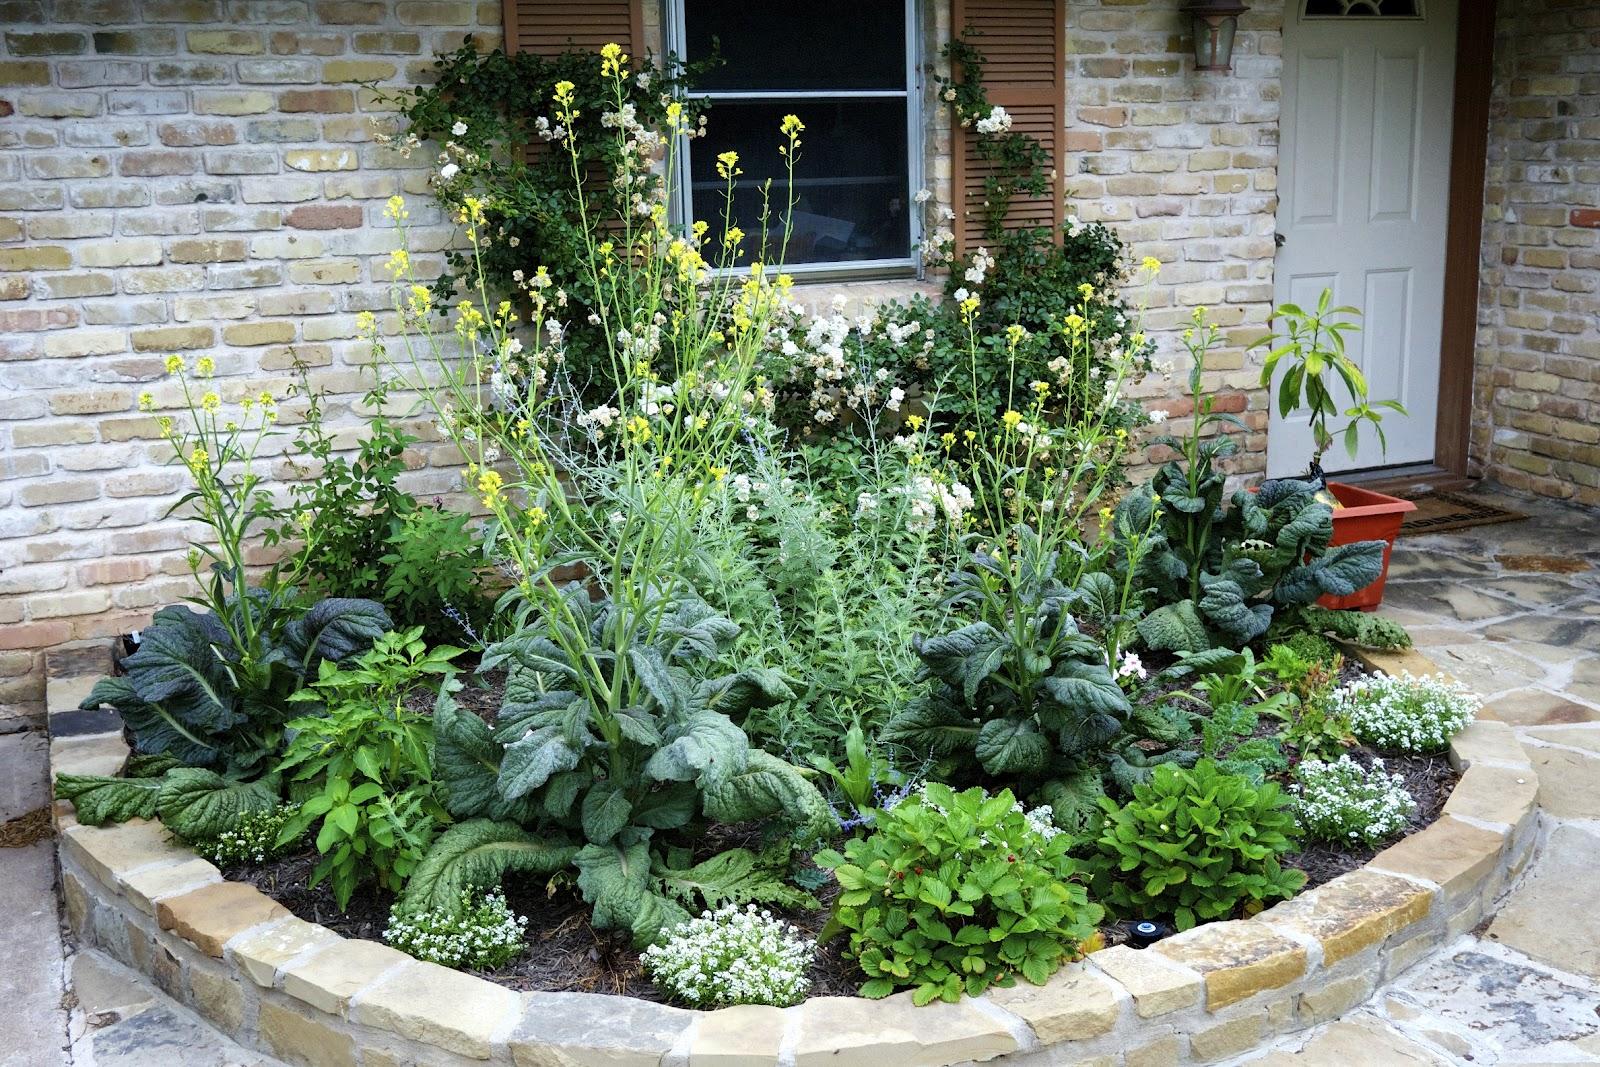 Backyard Edible Garden Ideas : Displaying 15> Images For  Front Yard Edible Garden Ideas